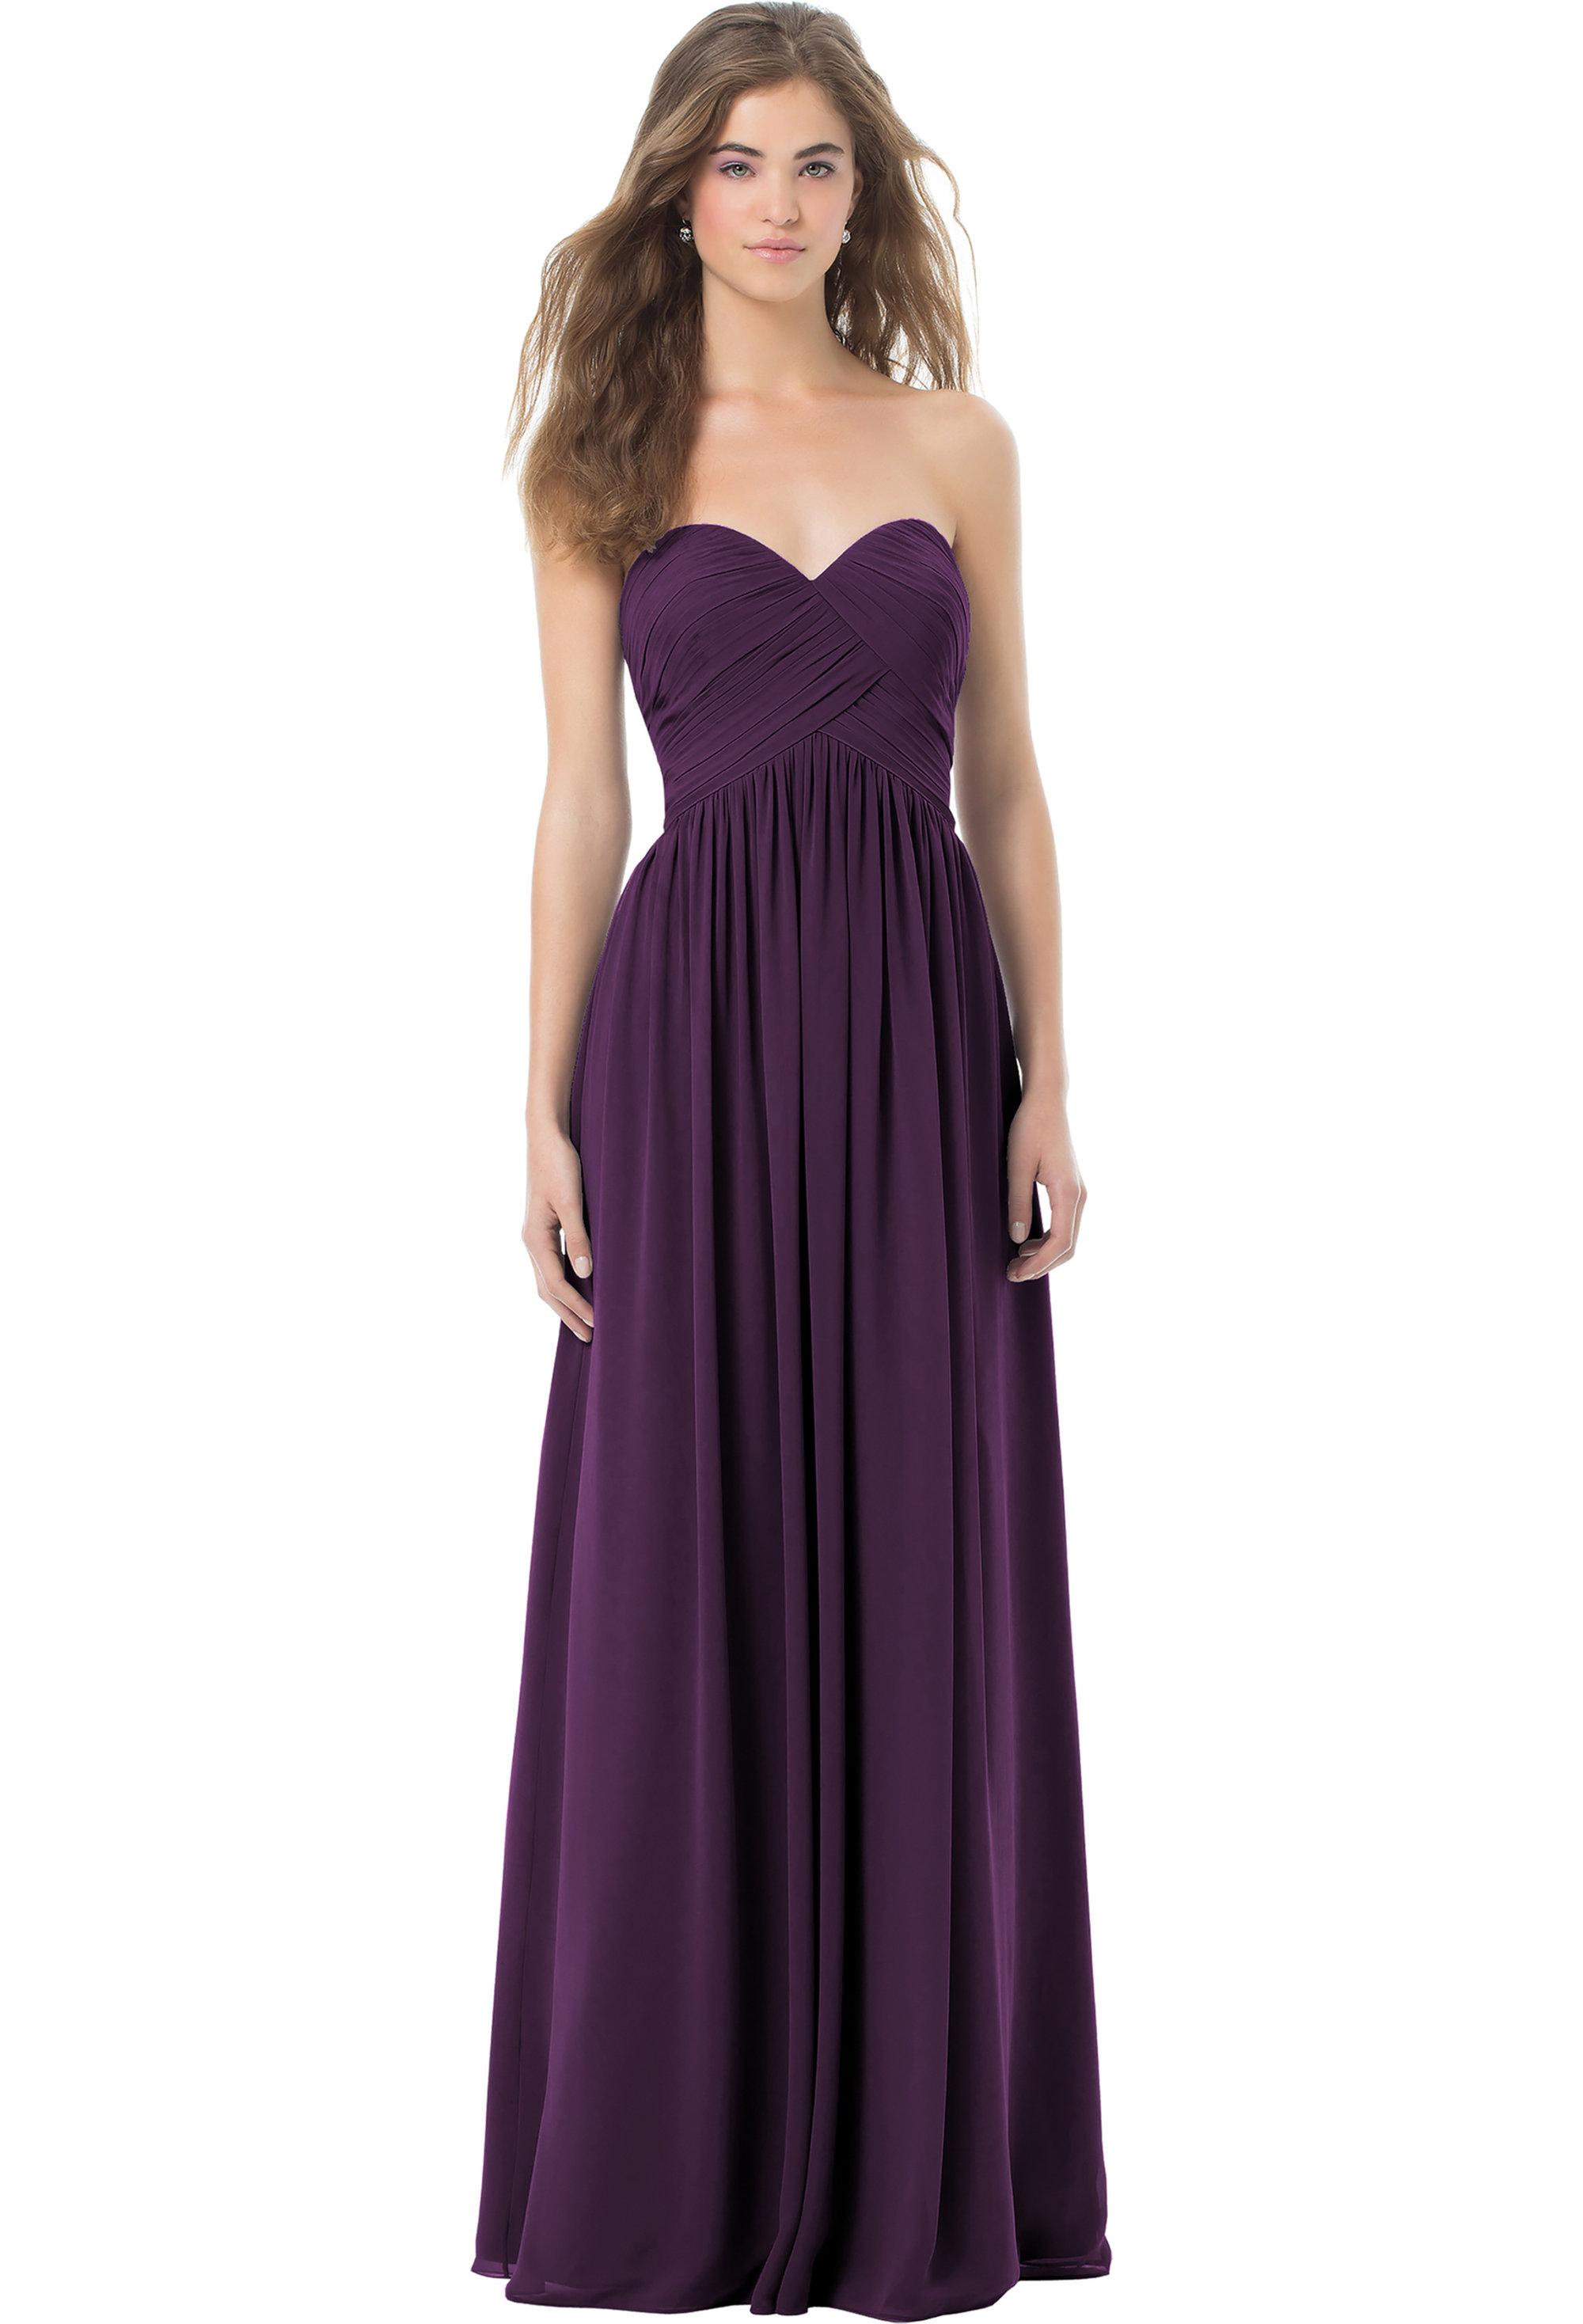 Bill Levkoff PLUM Chiffon Sweetheart A-line gown, $224.00 Front